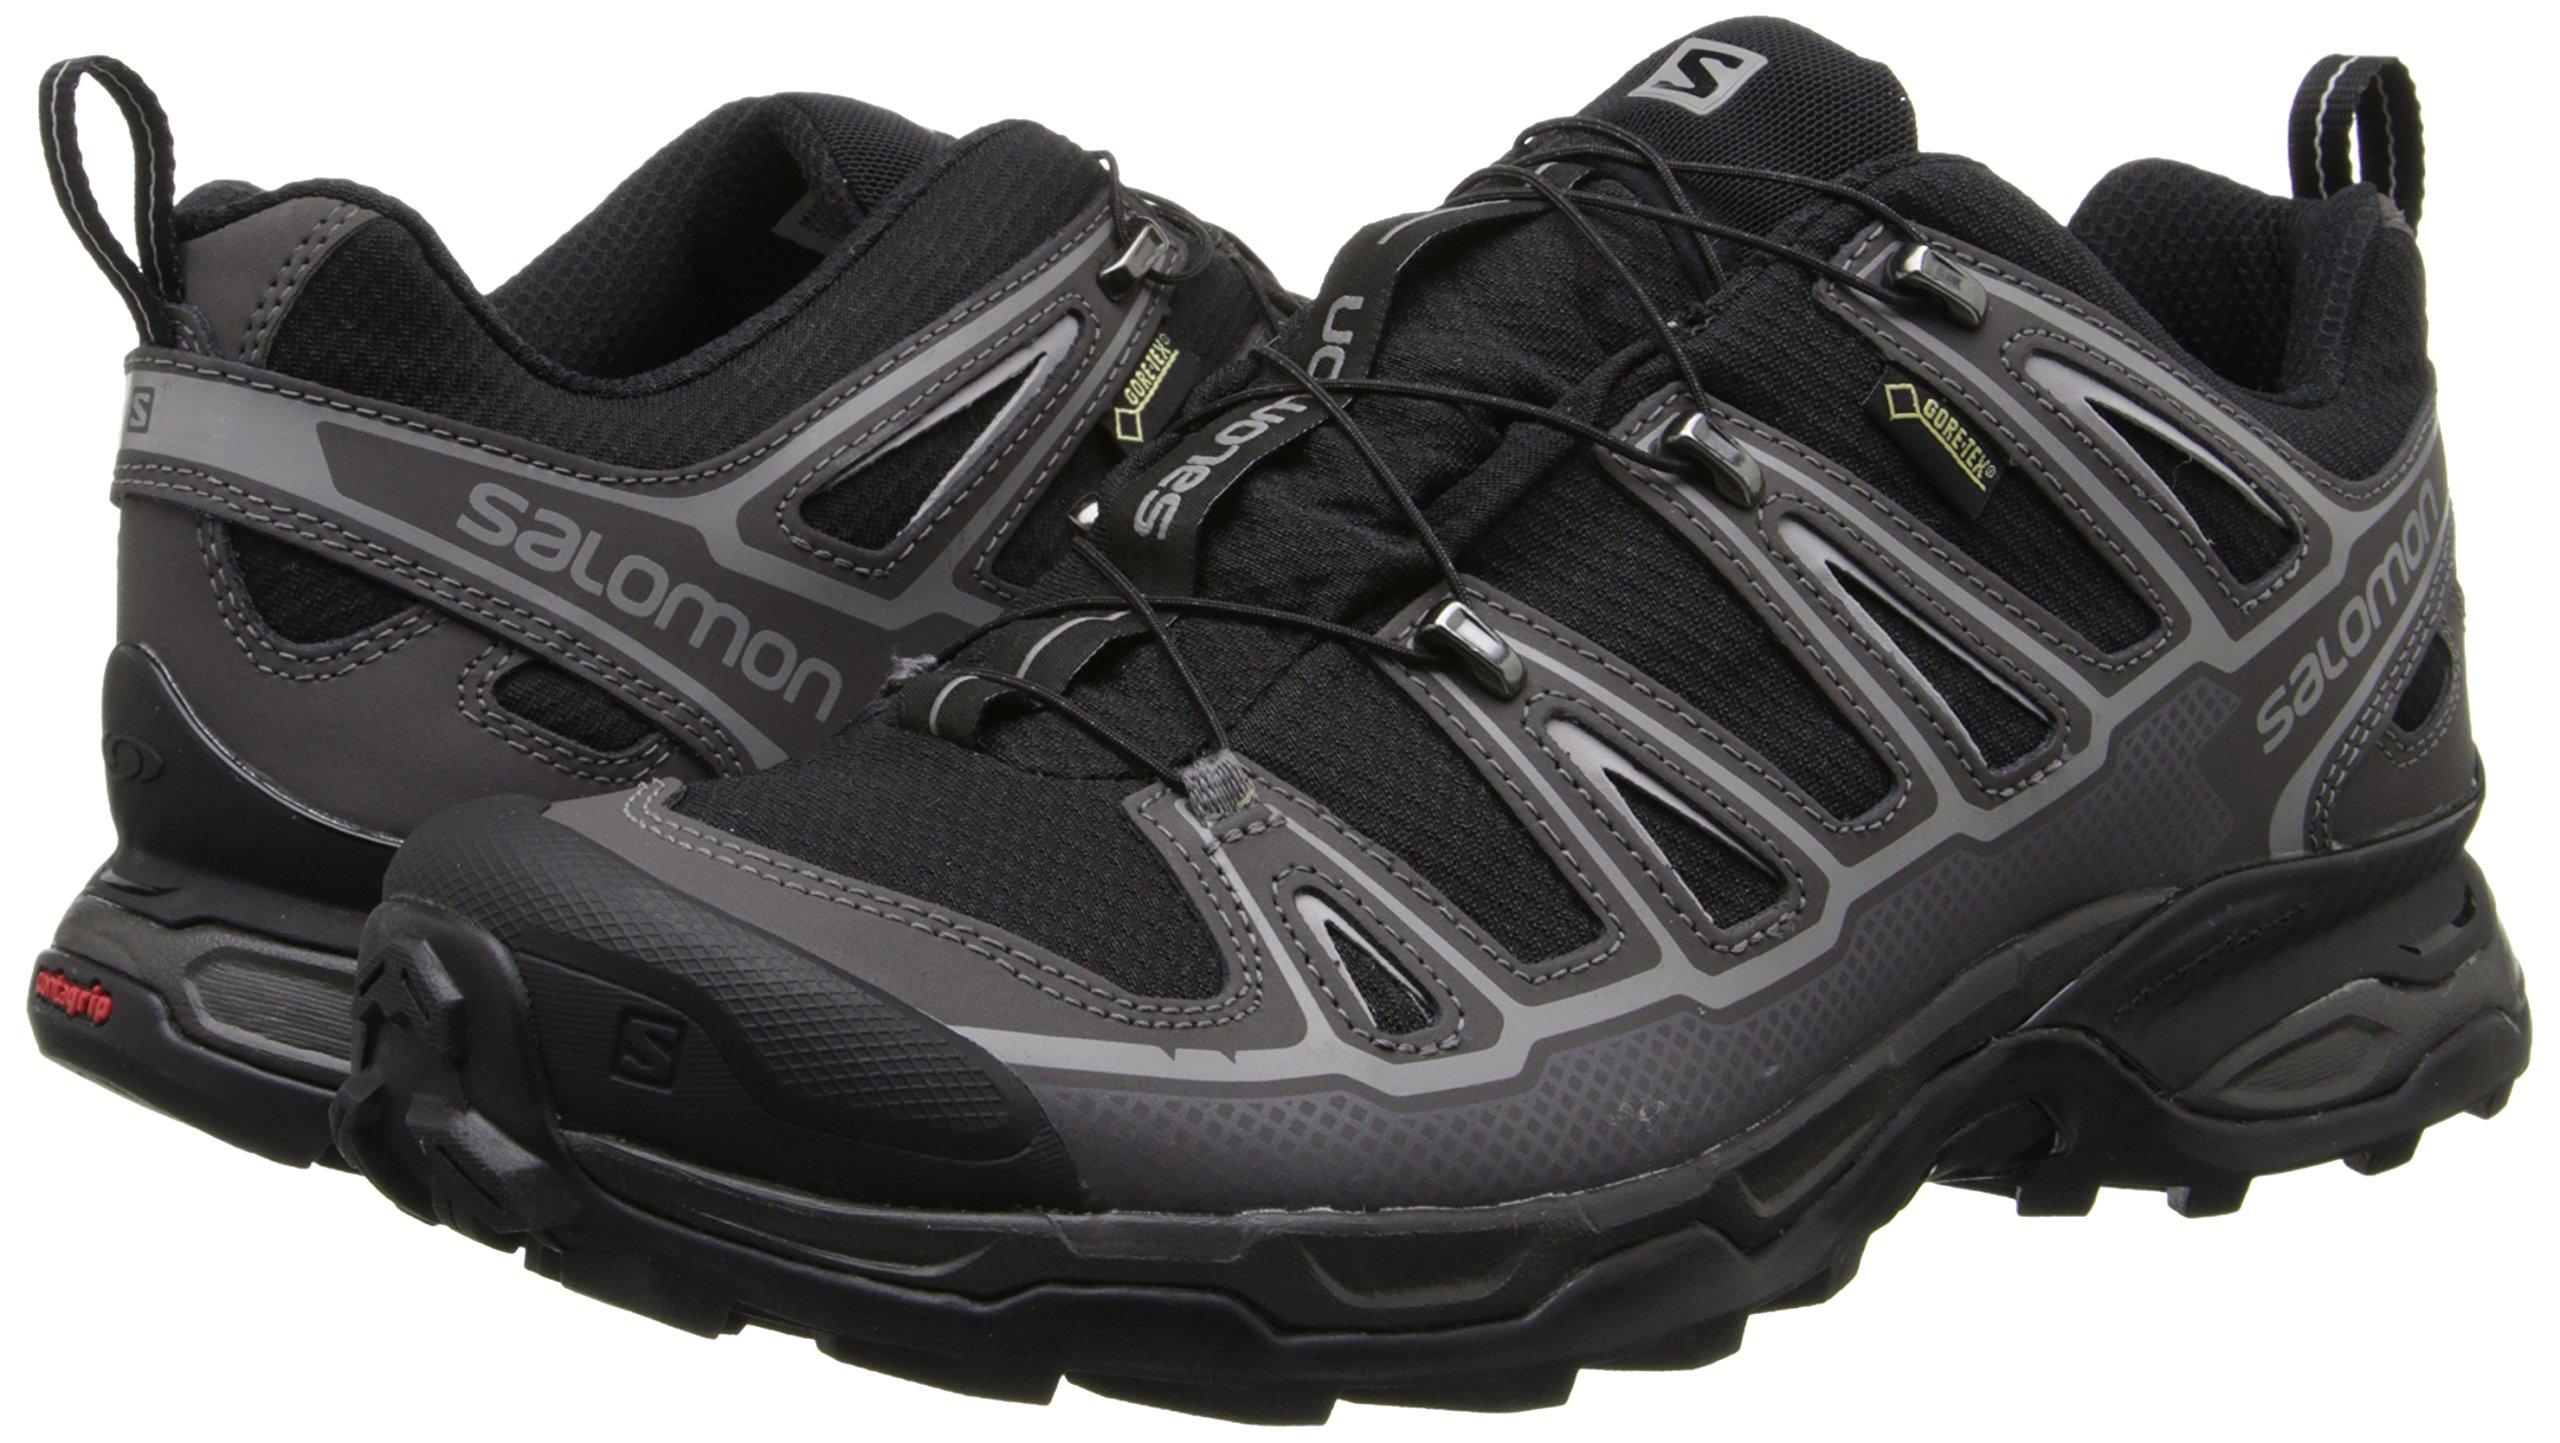 Salomon Men's X Ultra 2 GTX Hiking Shoe, Black/Autobahn/Aluminum, 7 M US by Salomon (Image #6)